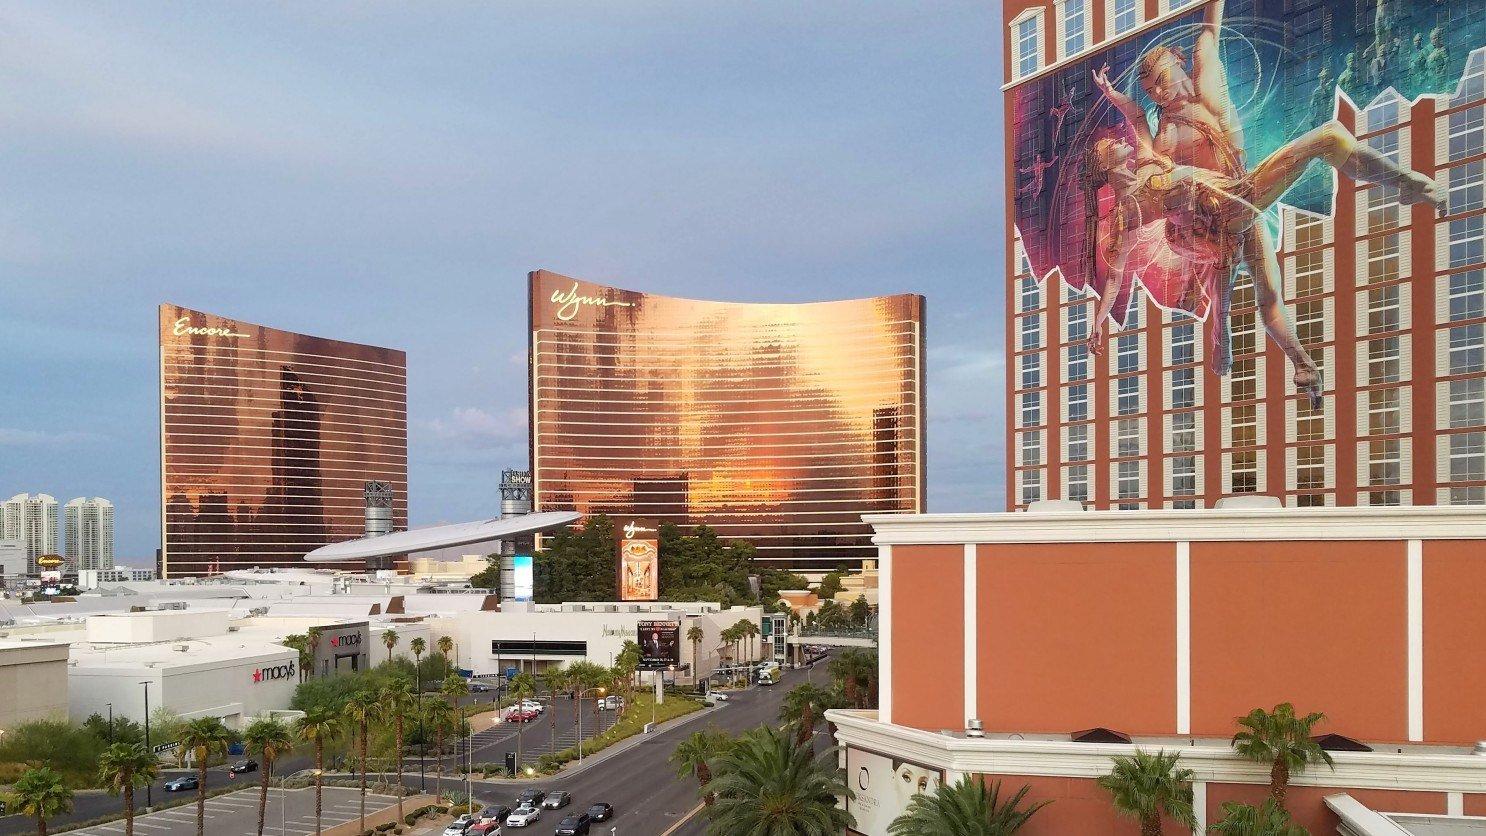 Vegas Wynn